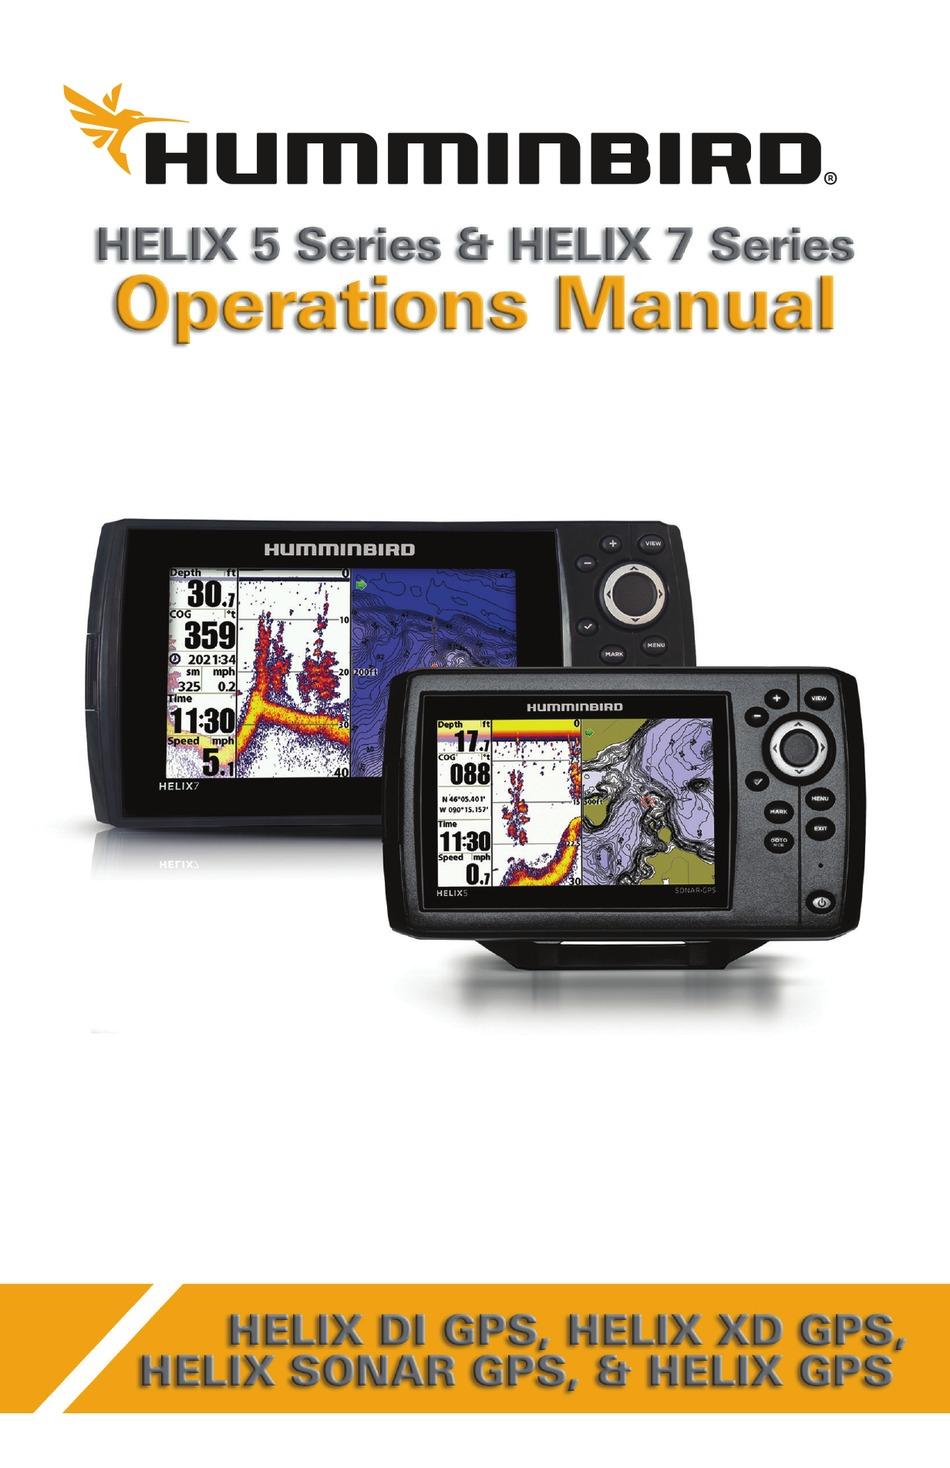 HUMMINBIRD HELIX 40 SERIES OPERATION MANUAL Pdf Download   ManualsLib